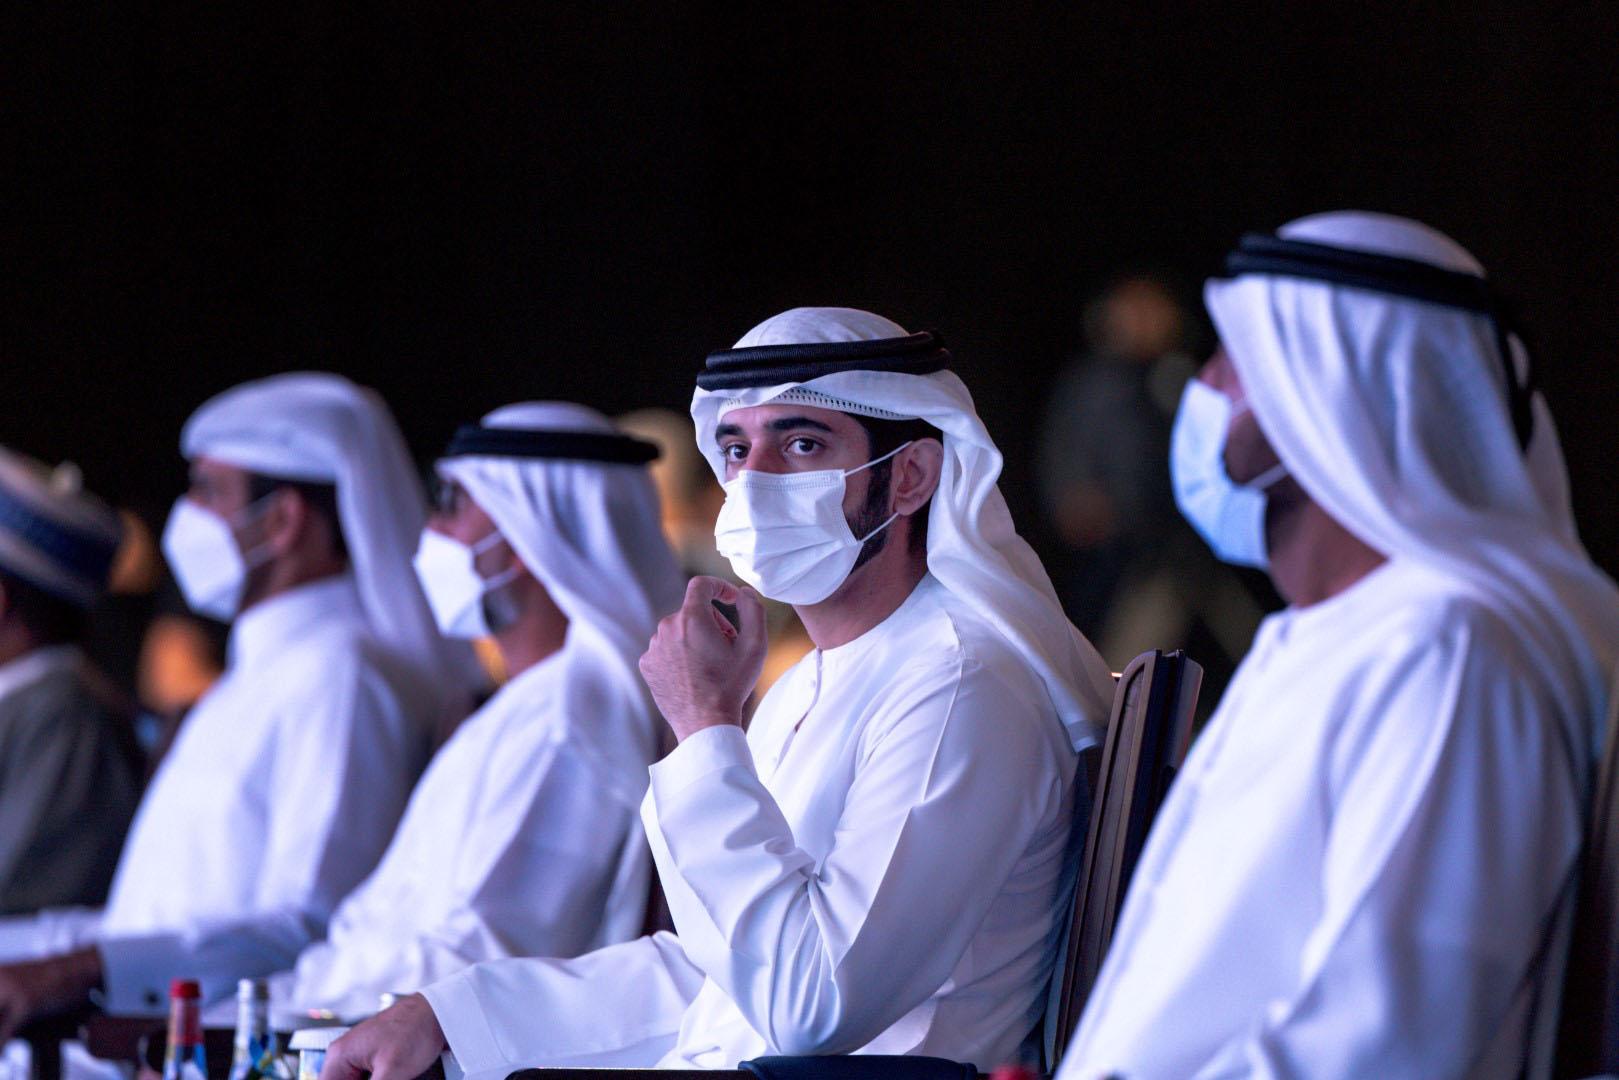 حمدان بن محمد يفتتح مؤتمر ومعرض غازتك